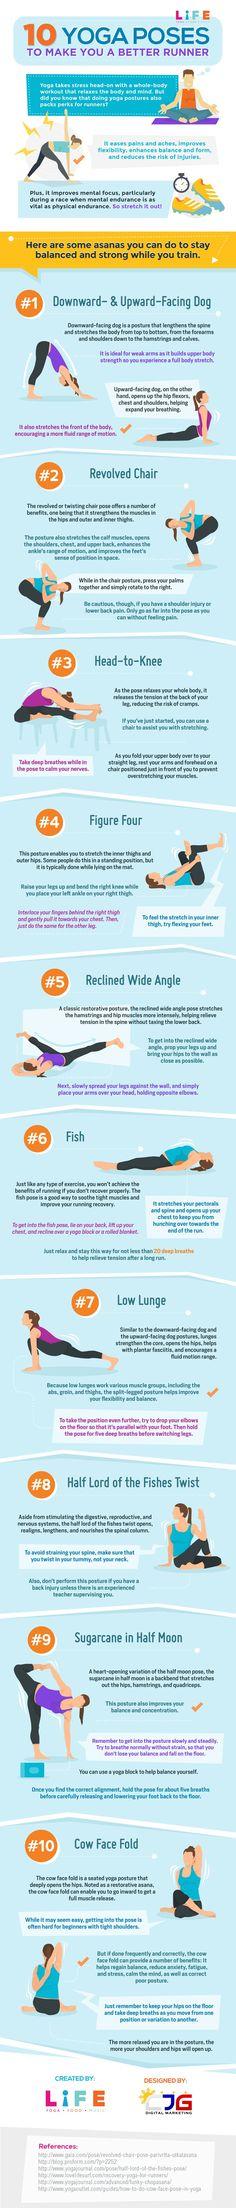 surya namaskar yoga per l arte di vivere la perdita di peso